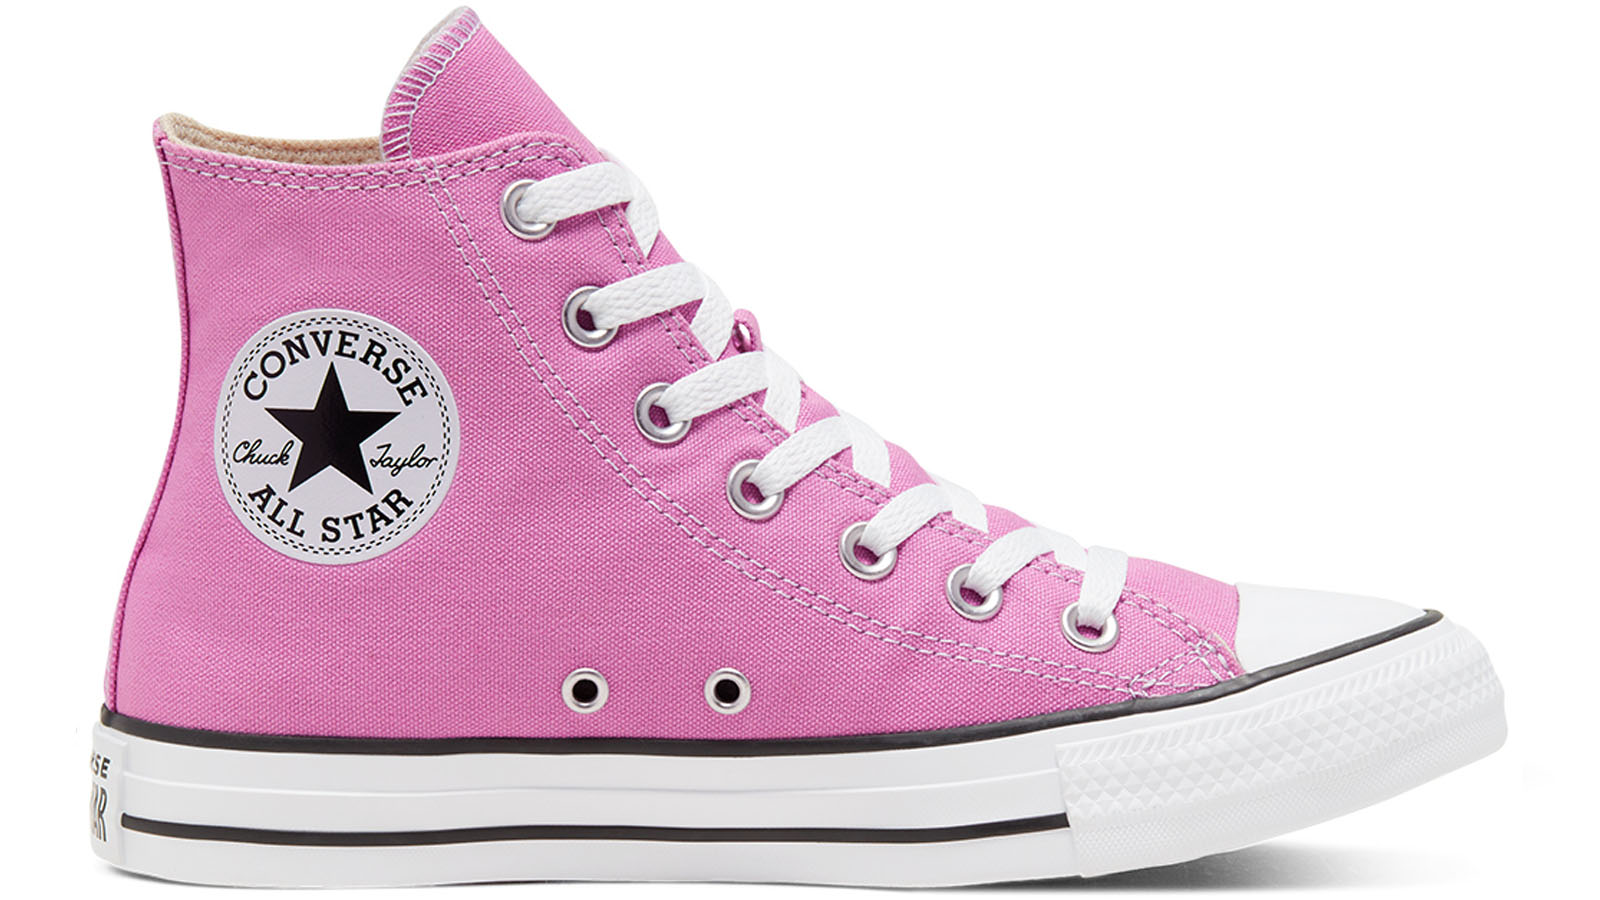 converse high top pink